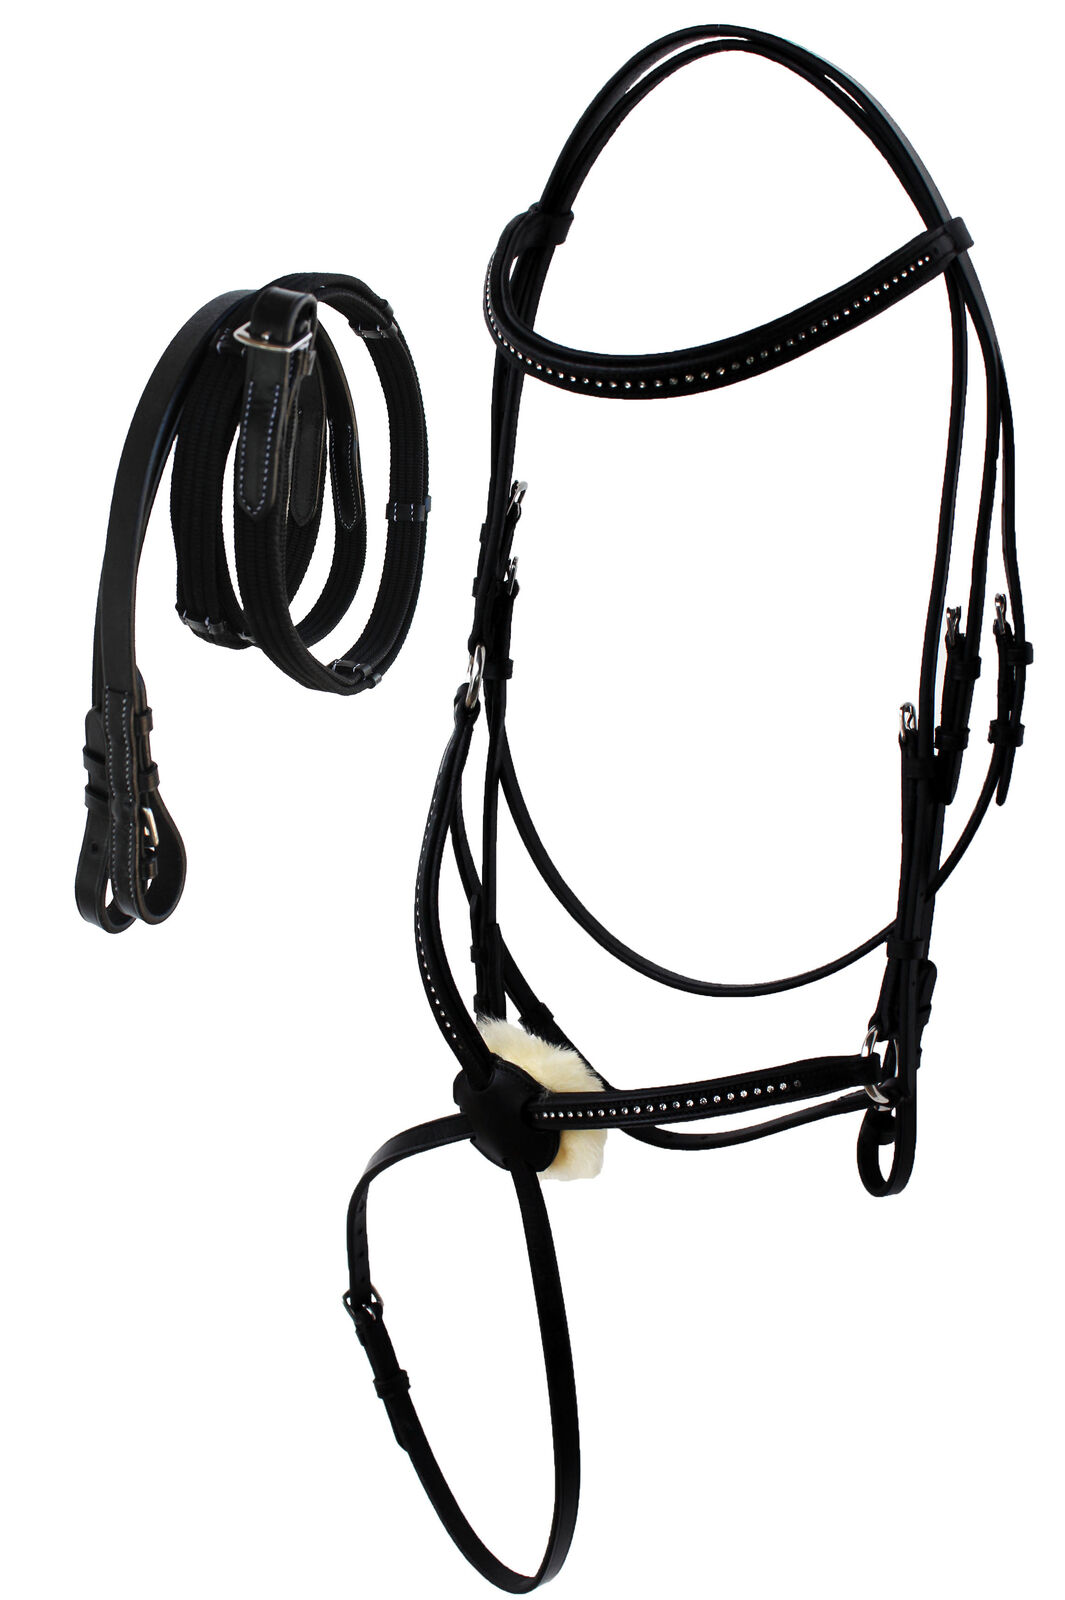 English All-Purpose Trail Pleasure Leather Bridle Reins 805EB05